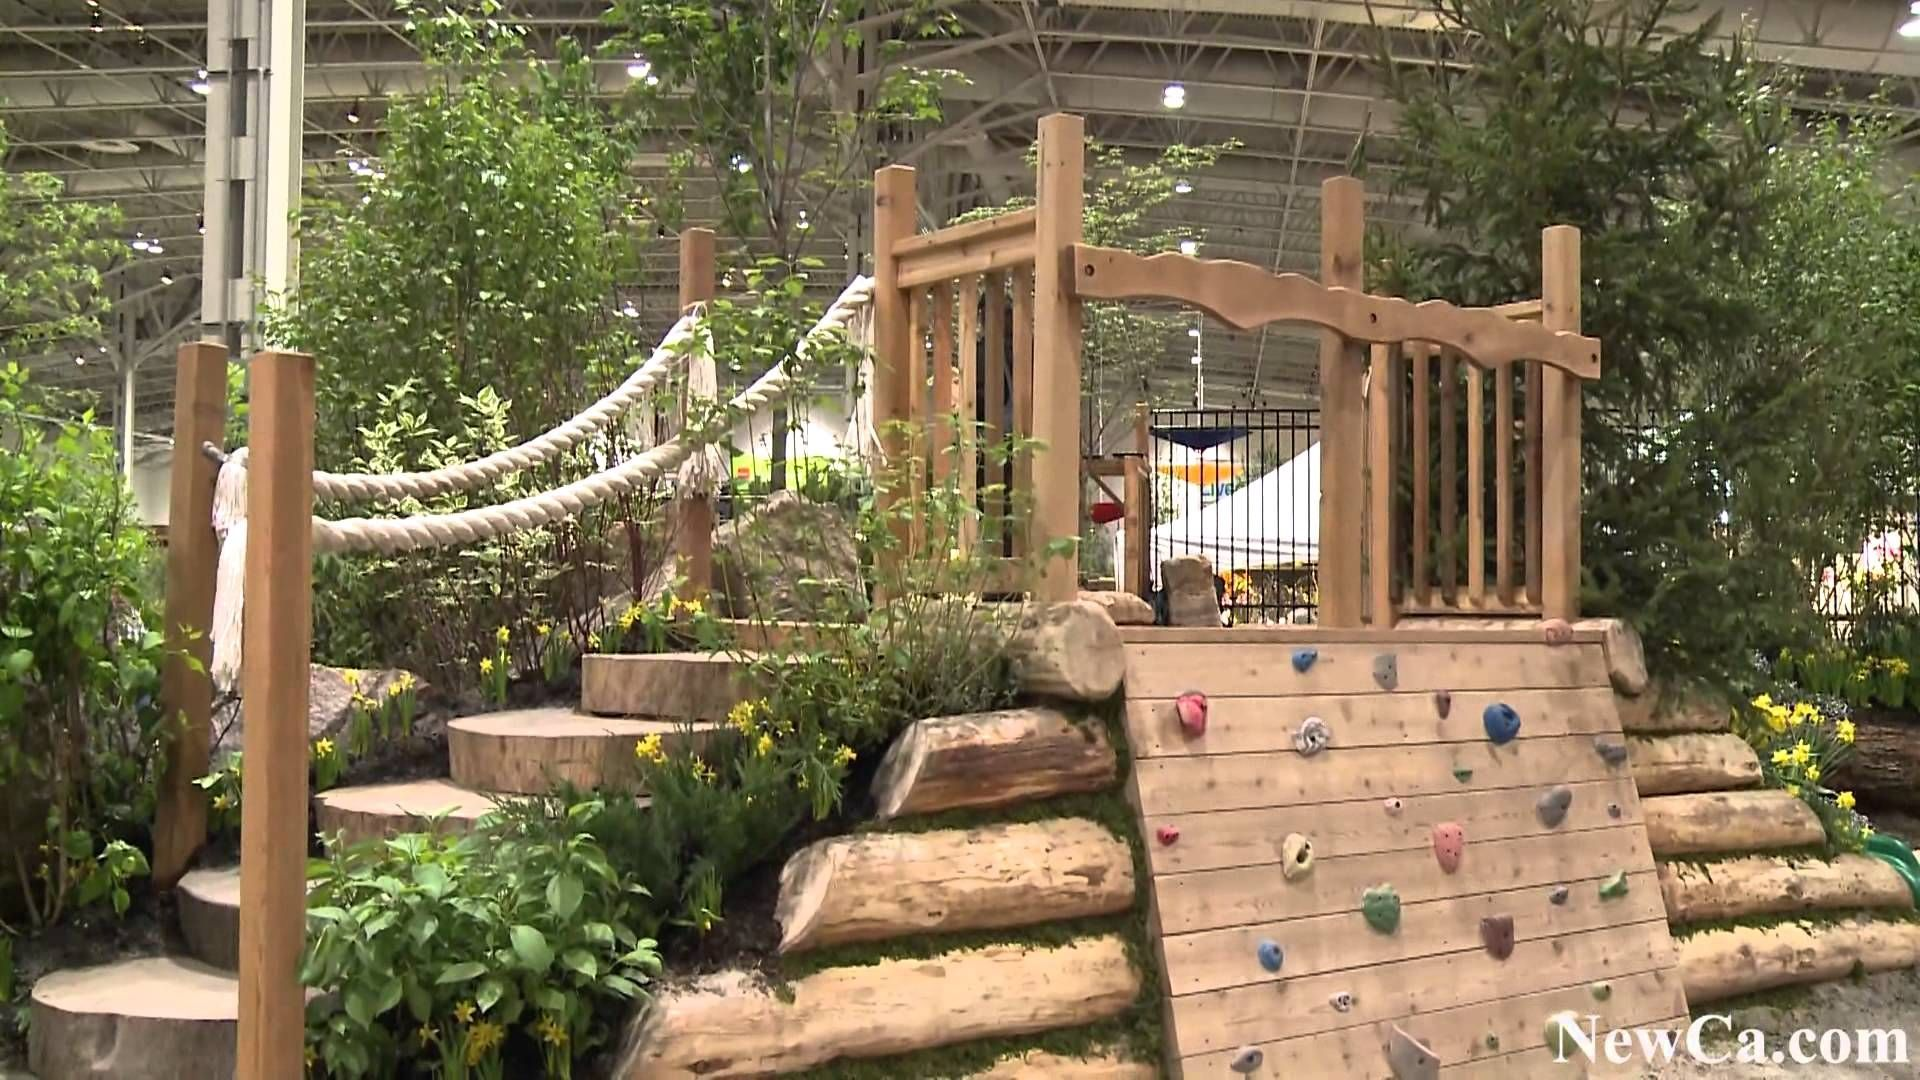 Bienenstock Natural Playgrounds at 2012 Canada